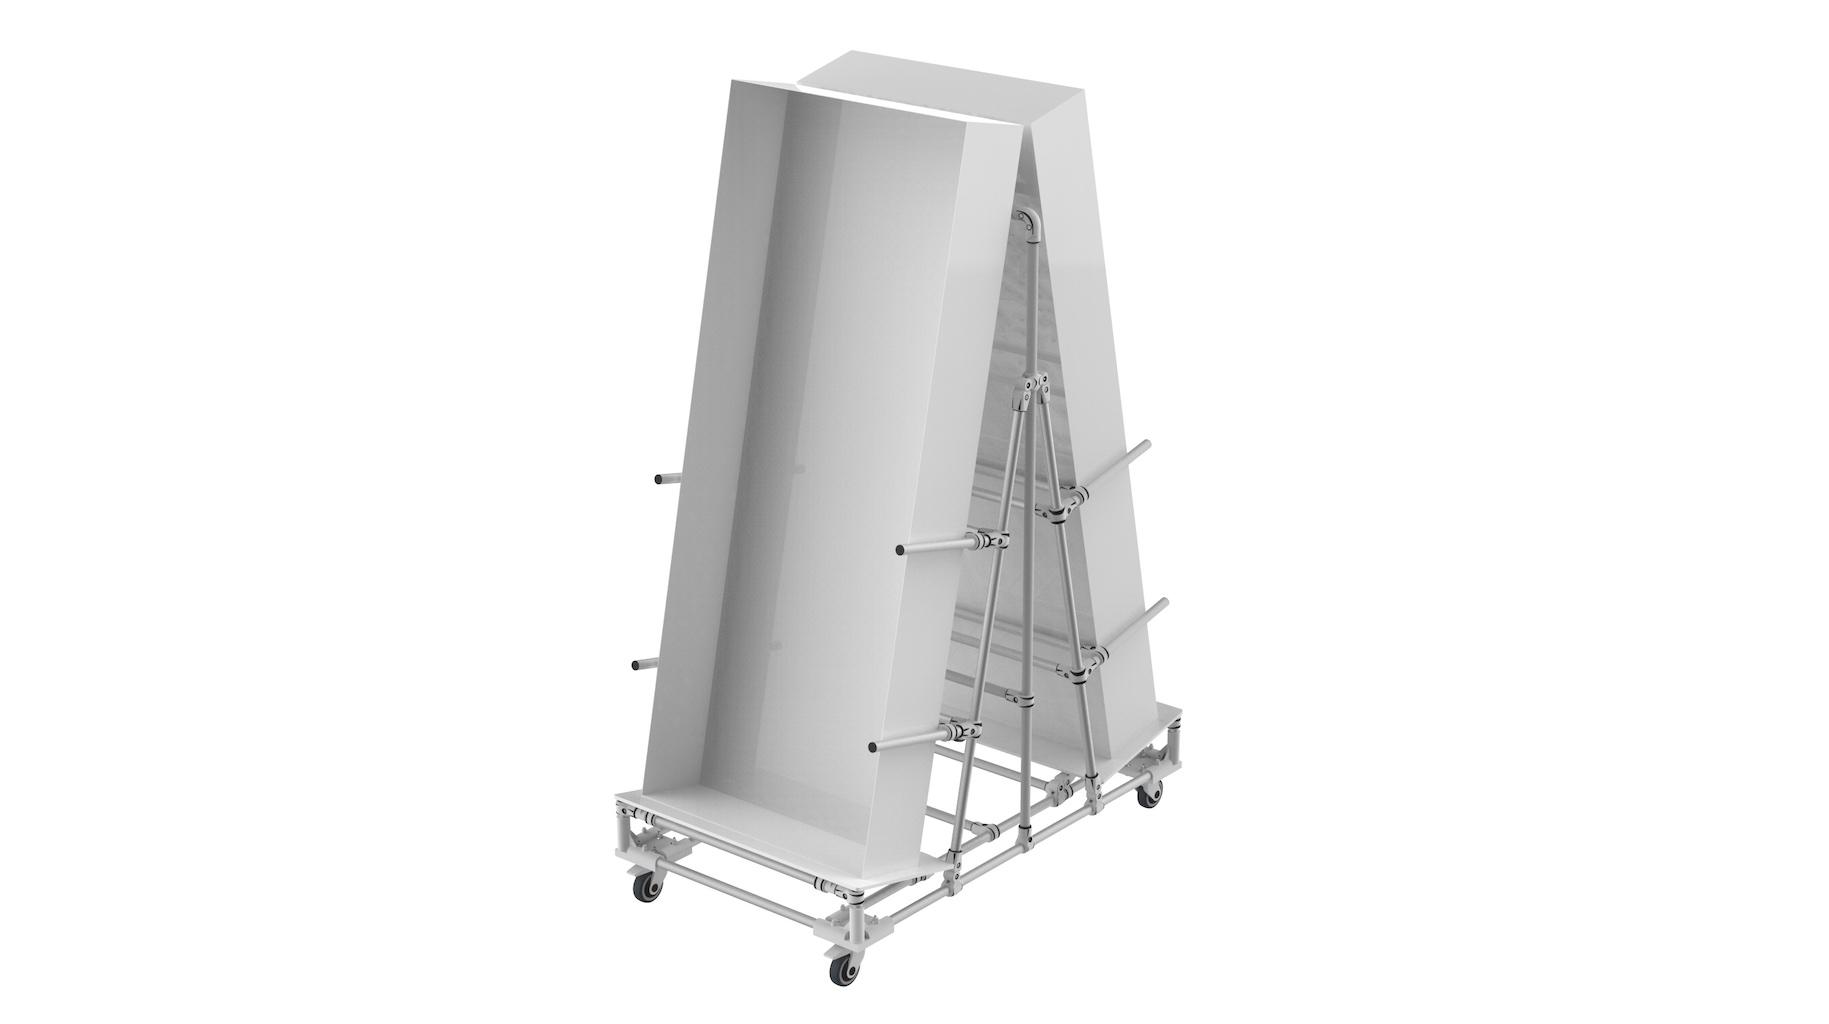 Aeronautic industry - 2 faces vertical presentation cart